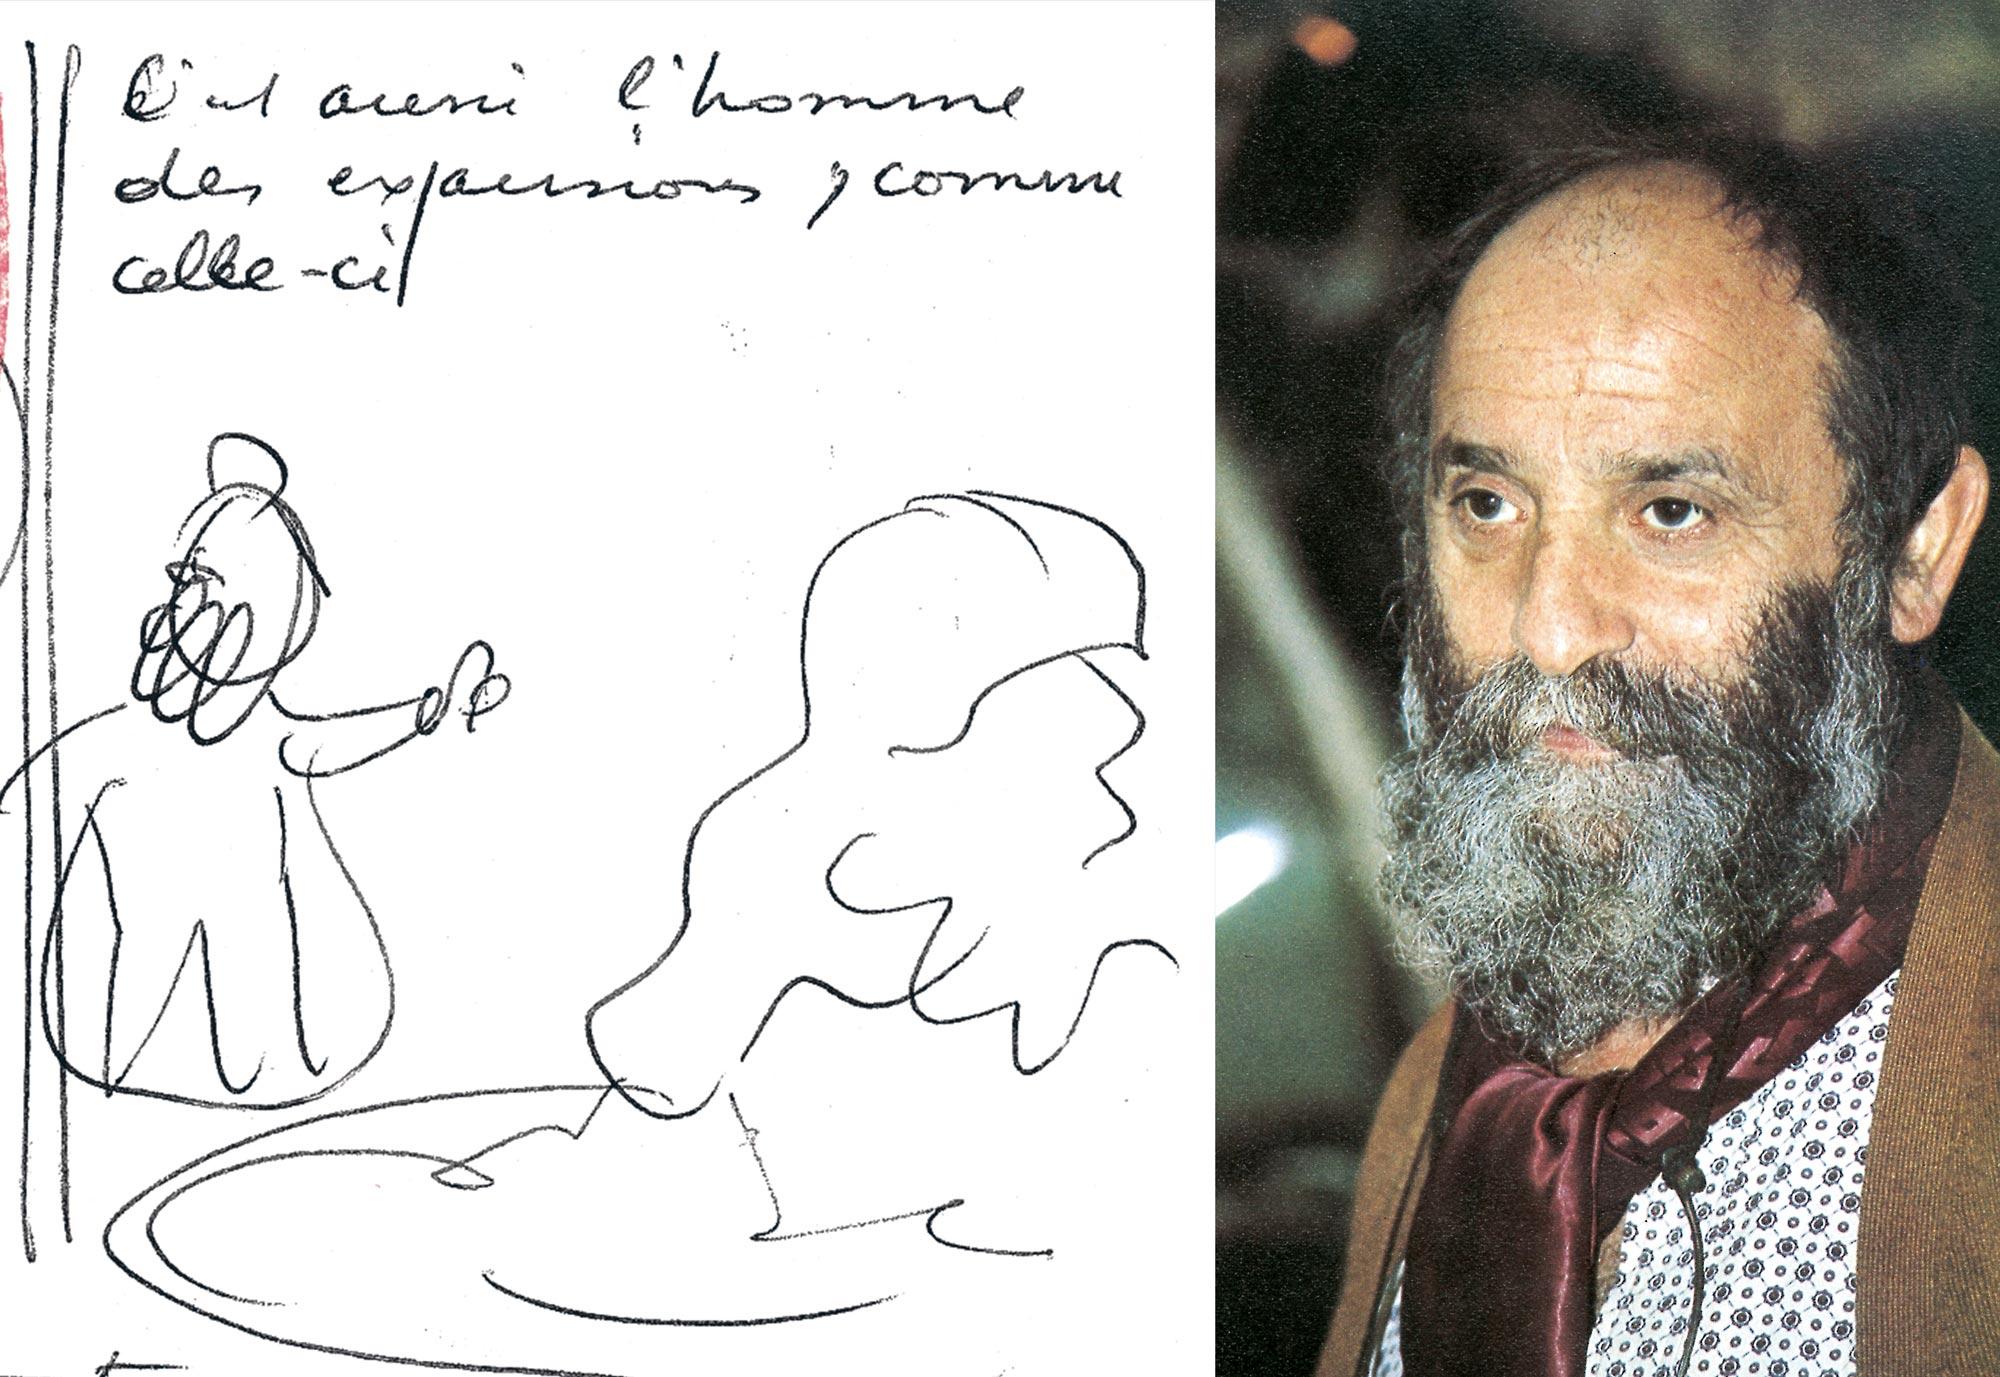 Tintin - Les Aventures de Tintin - Tintin et L'Alph-Art - Album Inachevé